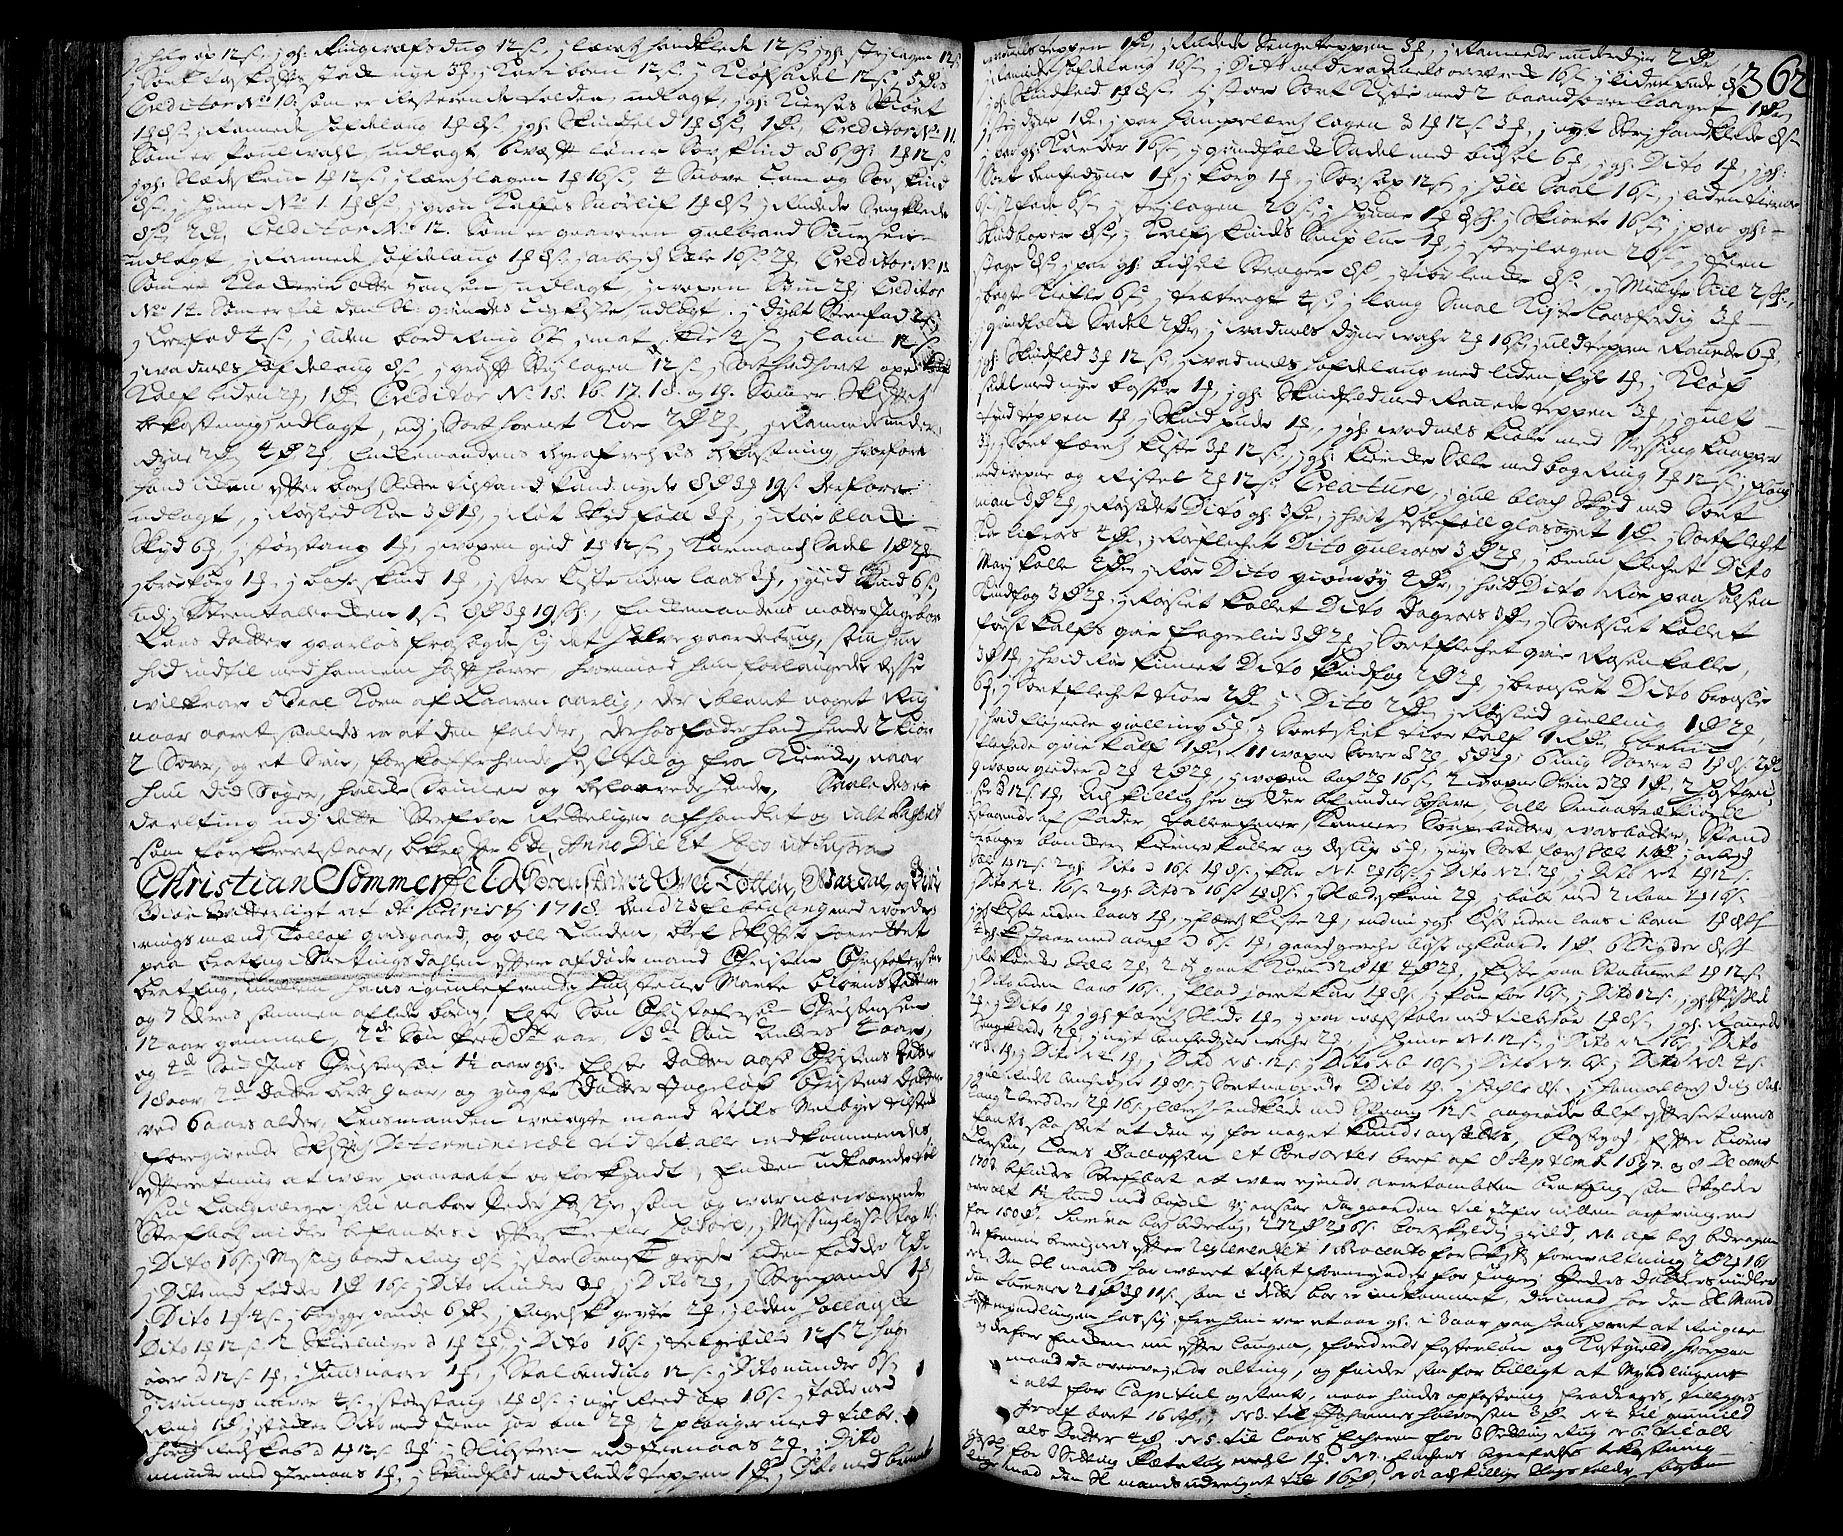 SAH, Toten tingrett, J/Ja/L0006: Skifteprotokoll, 1706-1722, s. 361b-362a